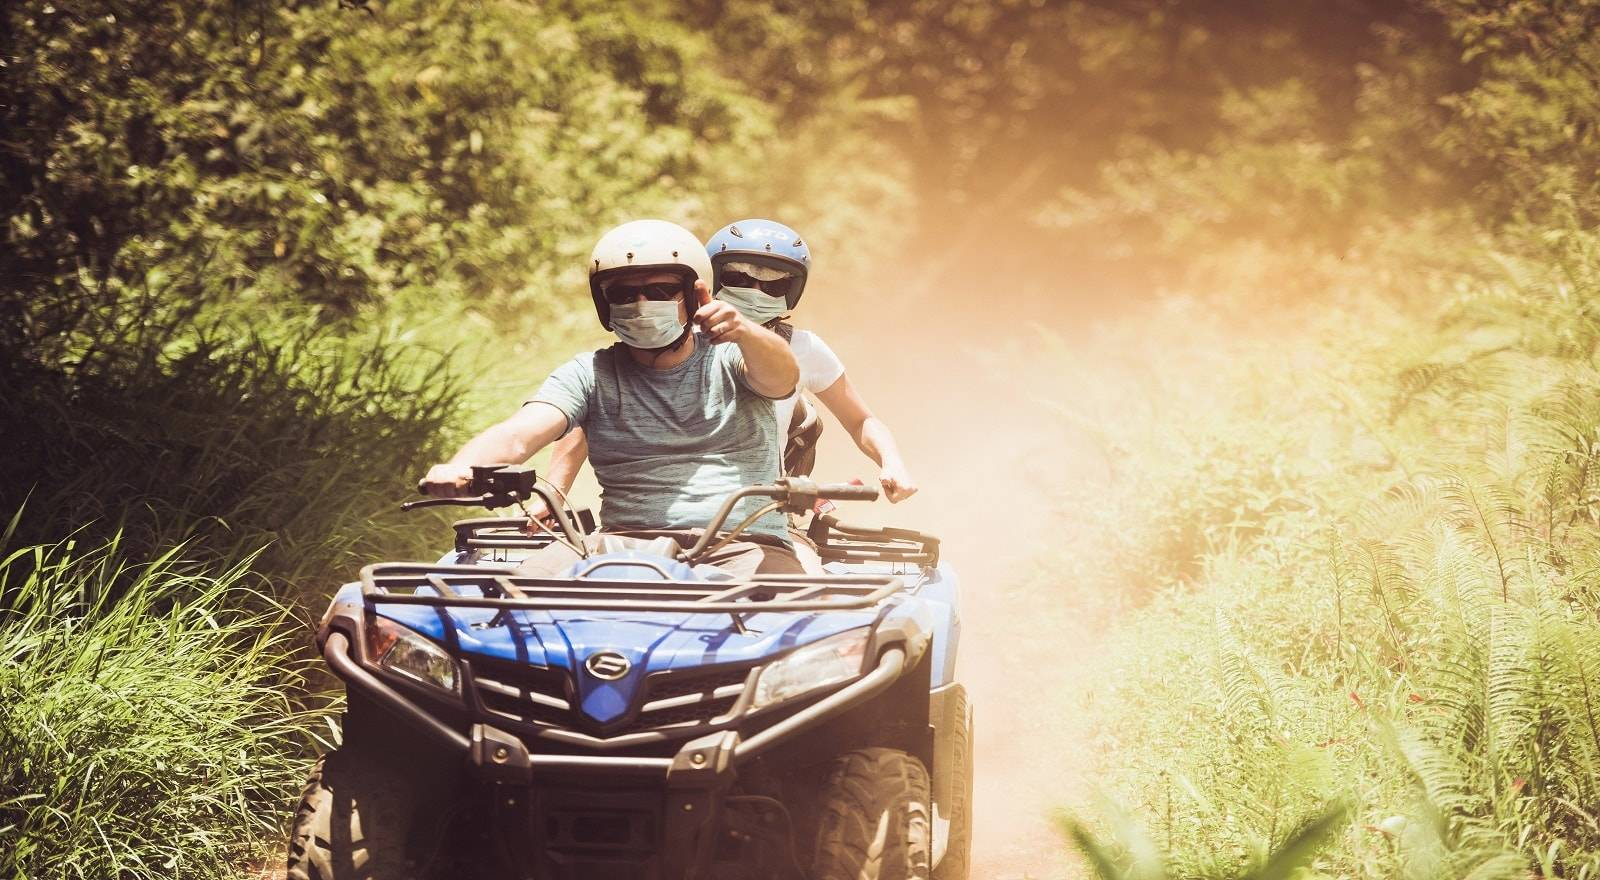 Quadbike Abenteuer in Mauritius - Gute Aussichten